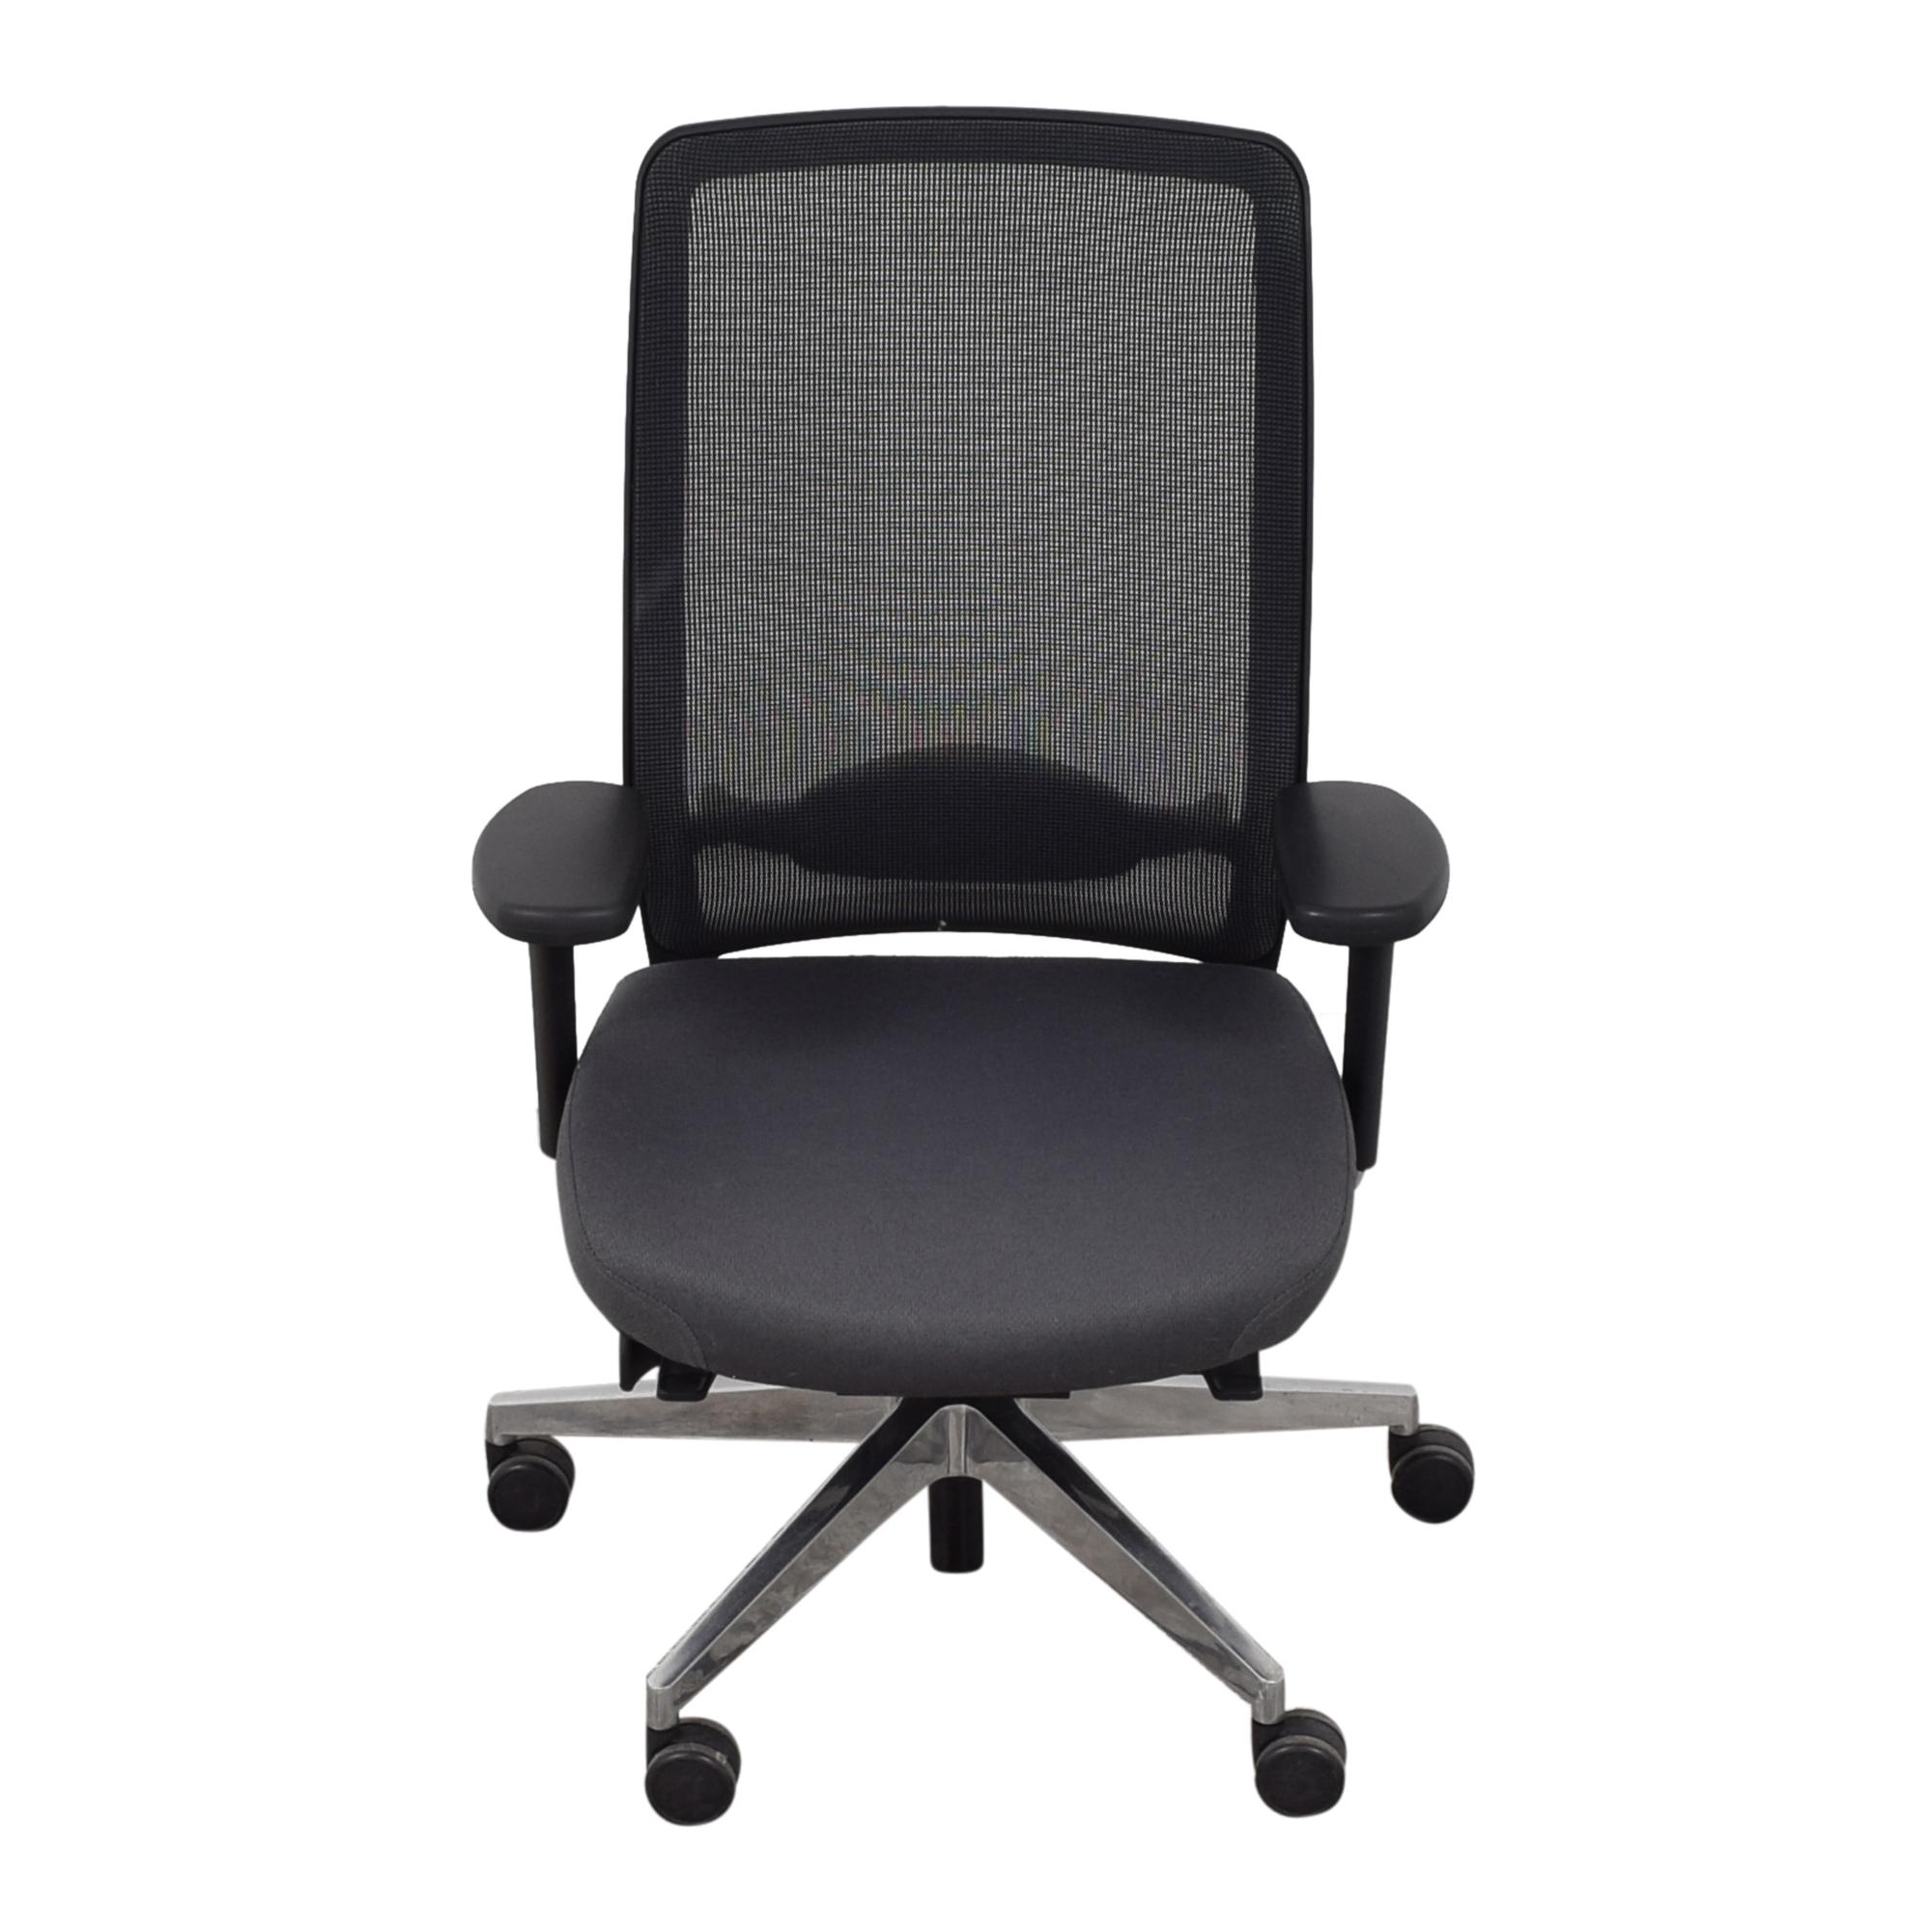 West Elm West Elm Task Chair